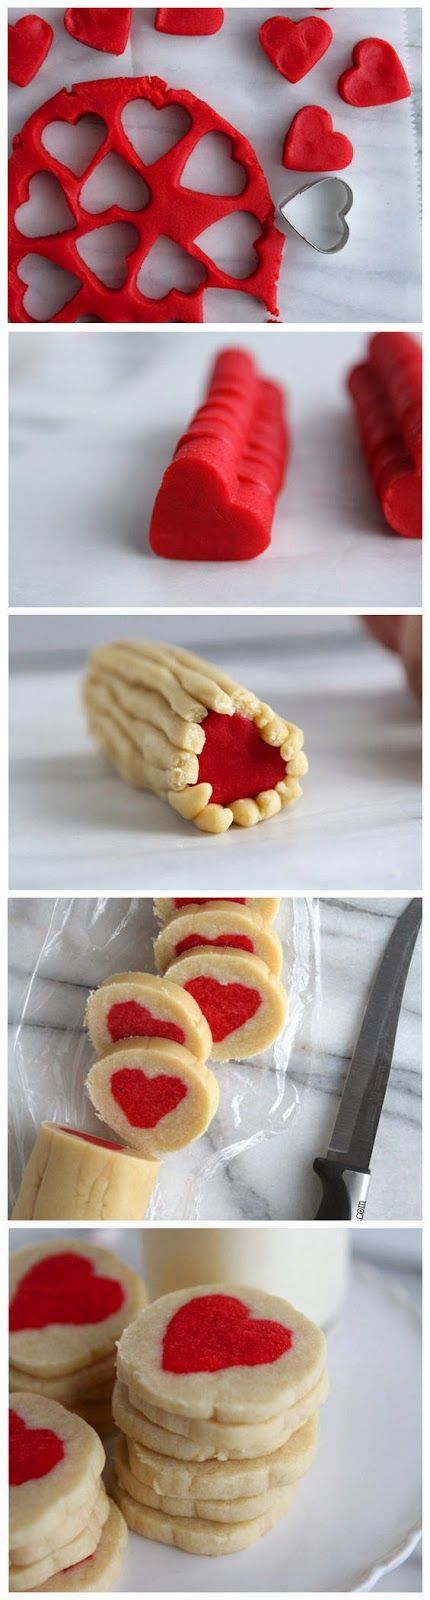 Slice n' Bake Heart Cookies (scheduled via http://www.tailwindapp.com?utm_source=pinterest&utm_medium=twpin&utm_content=post597885&utm_campaign=scheduler_attribution)